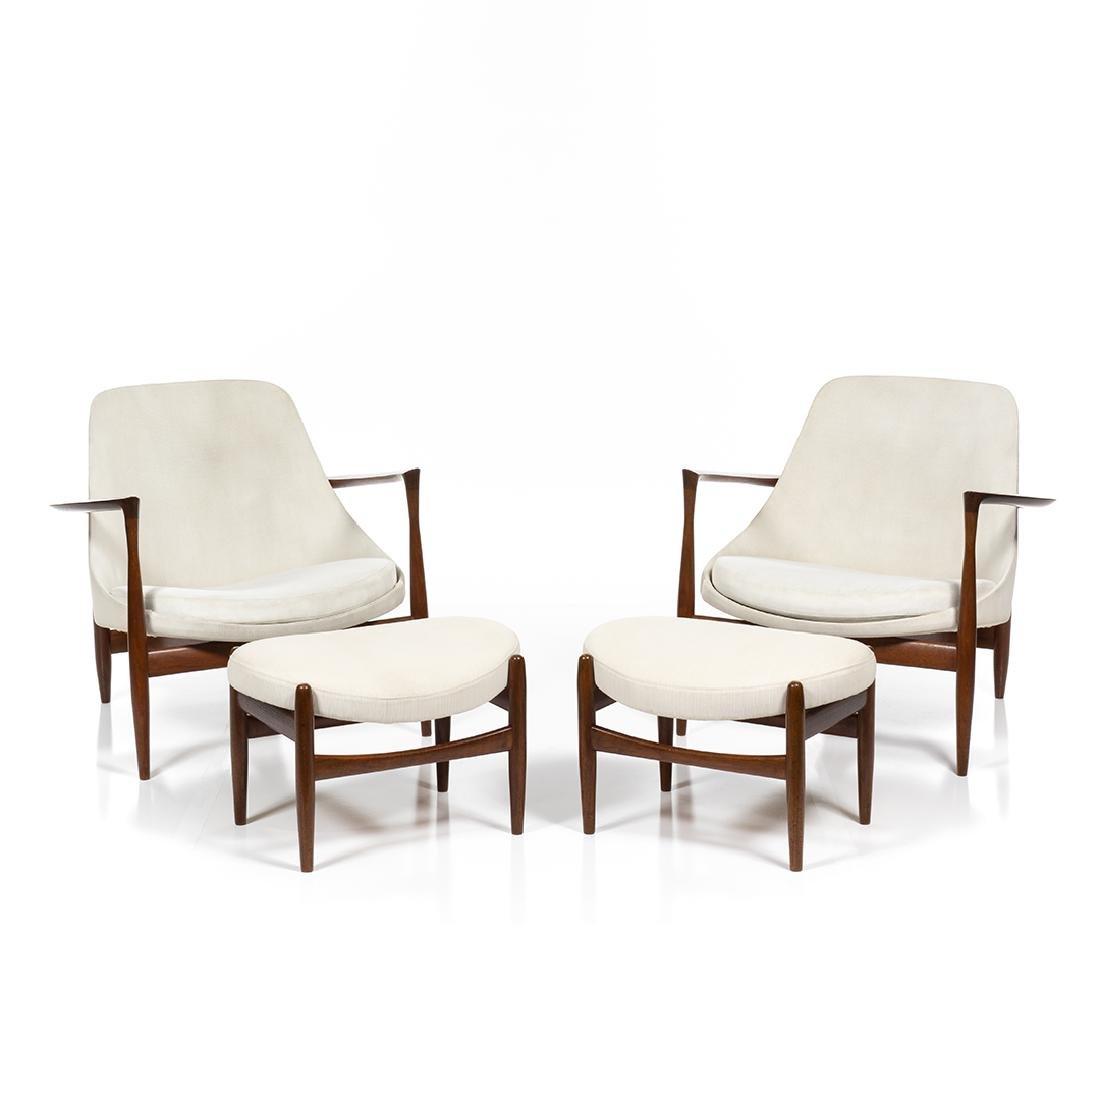 IB Kofod Larsen Elizabeth Chairs